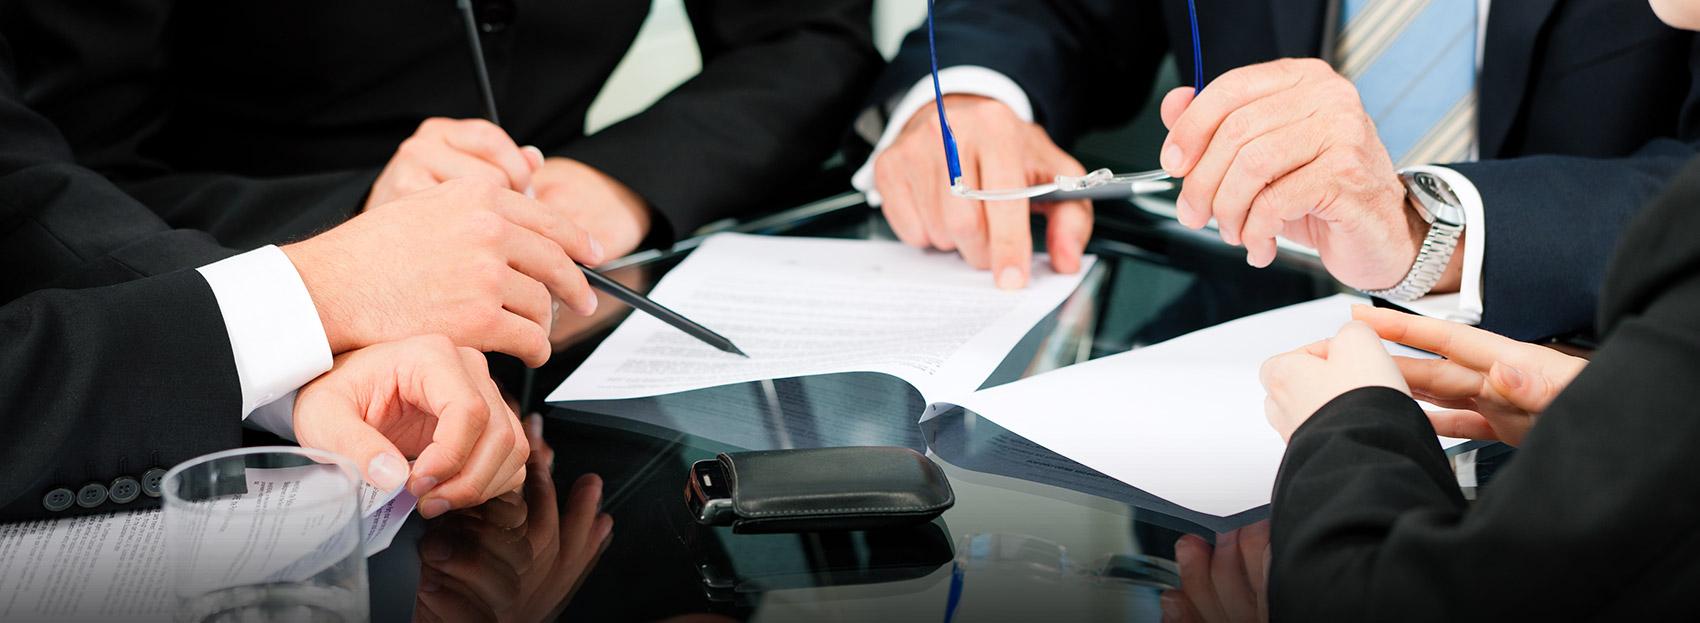 juridicheskie uslugi-korporativnoe pravo-besplatnaja konsul'tacija, Юридические услуги – Корпоративное право- Бесплатная консультация